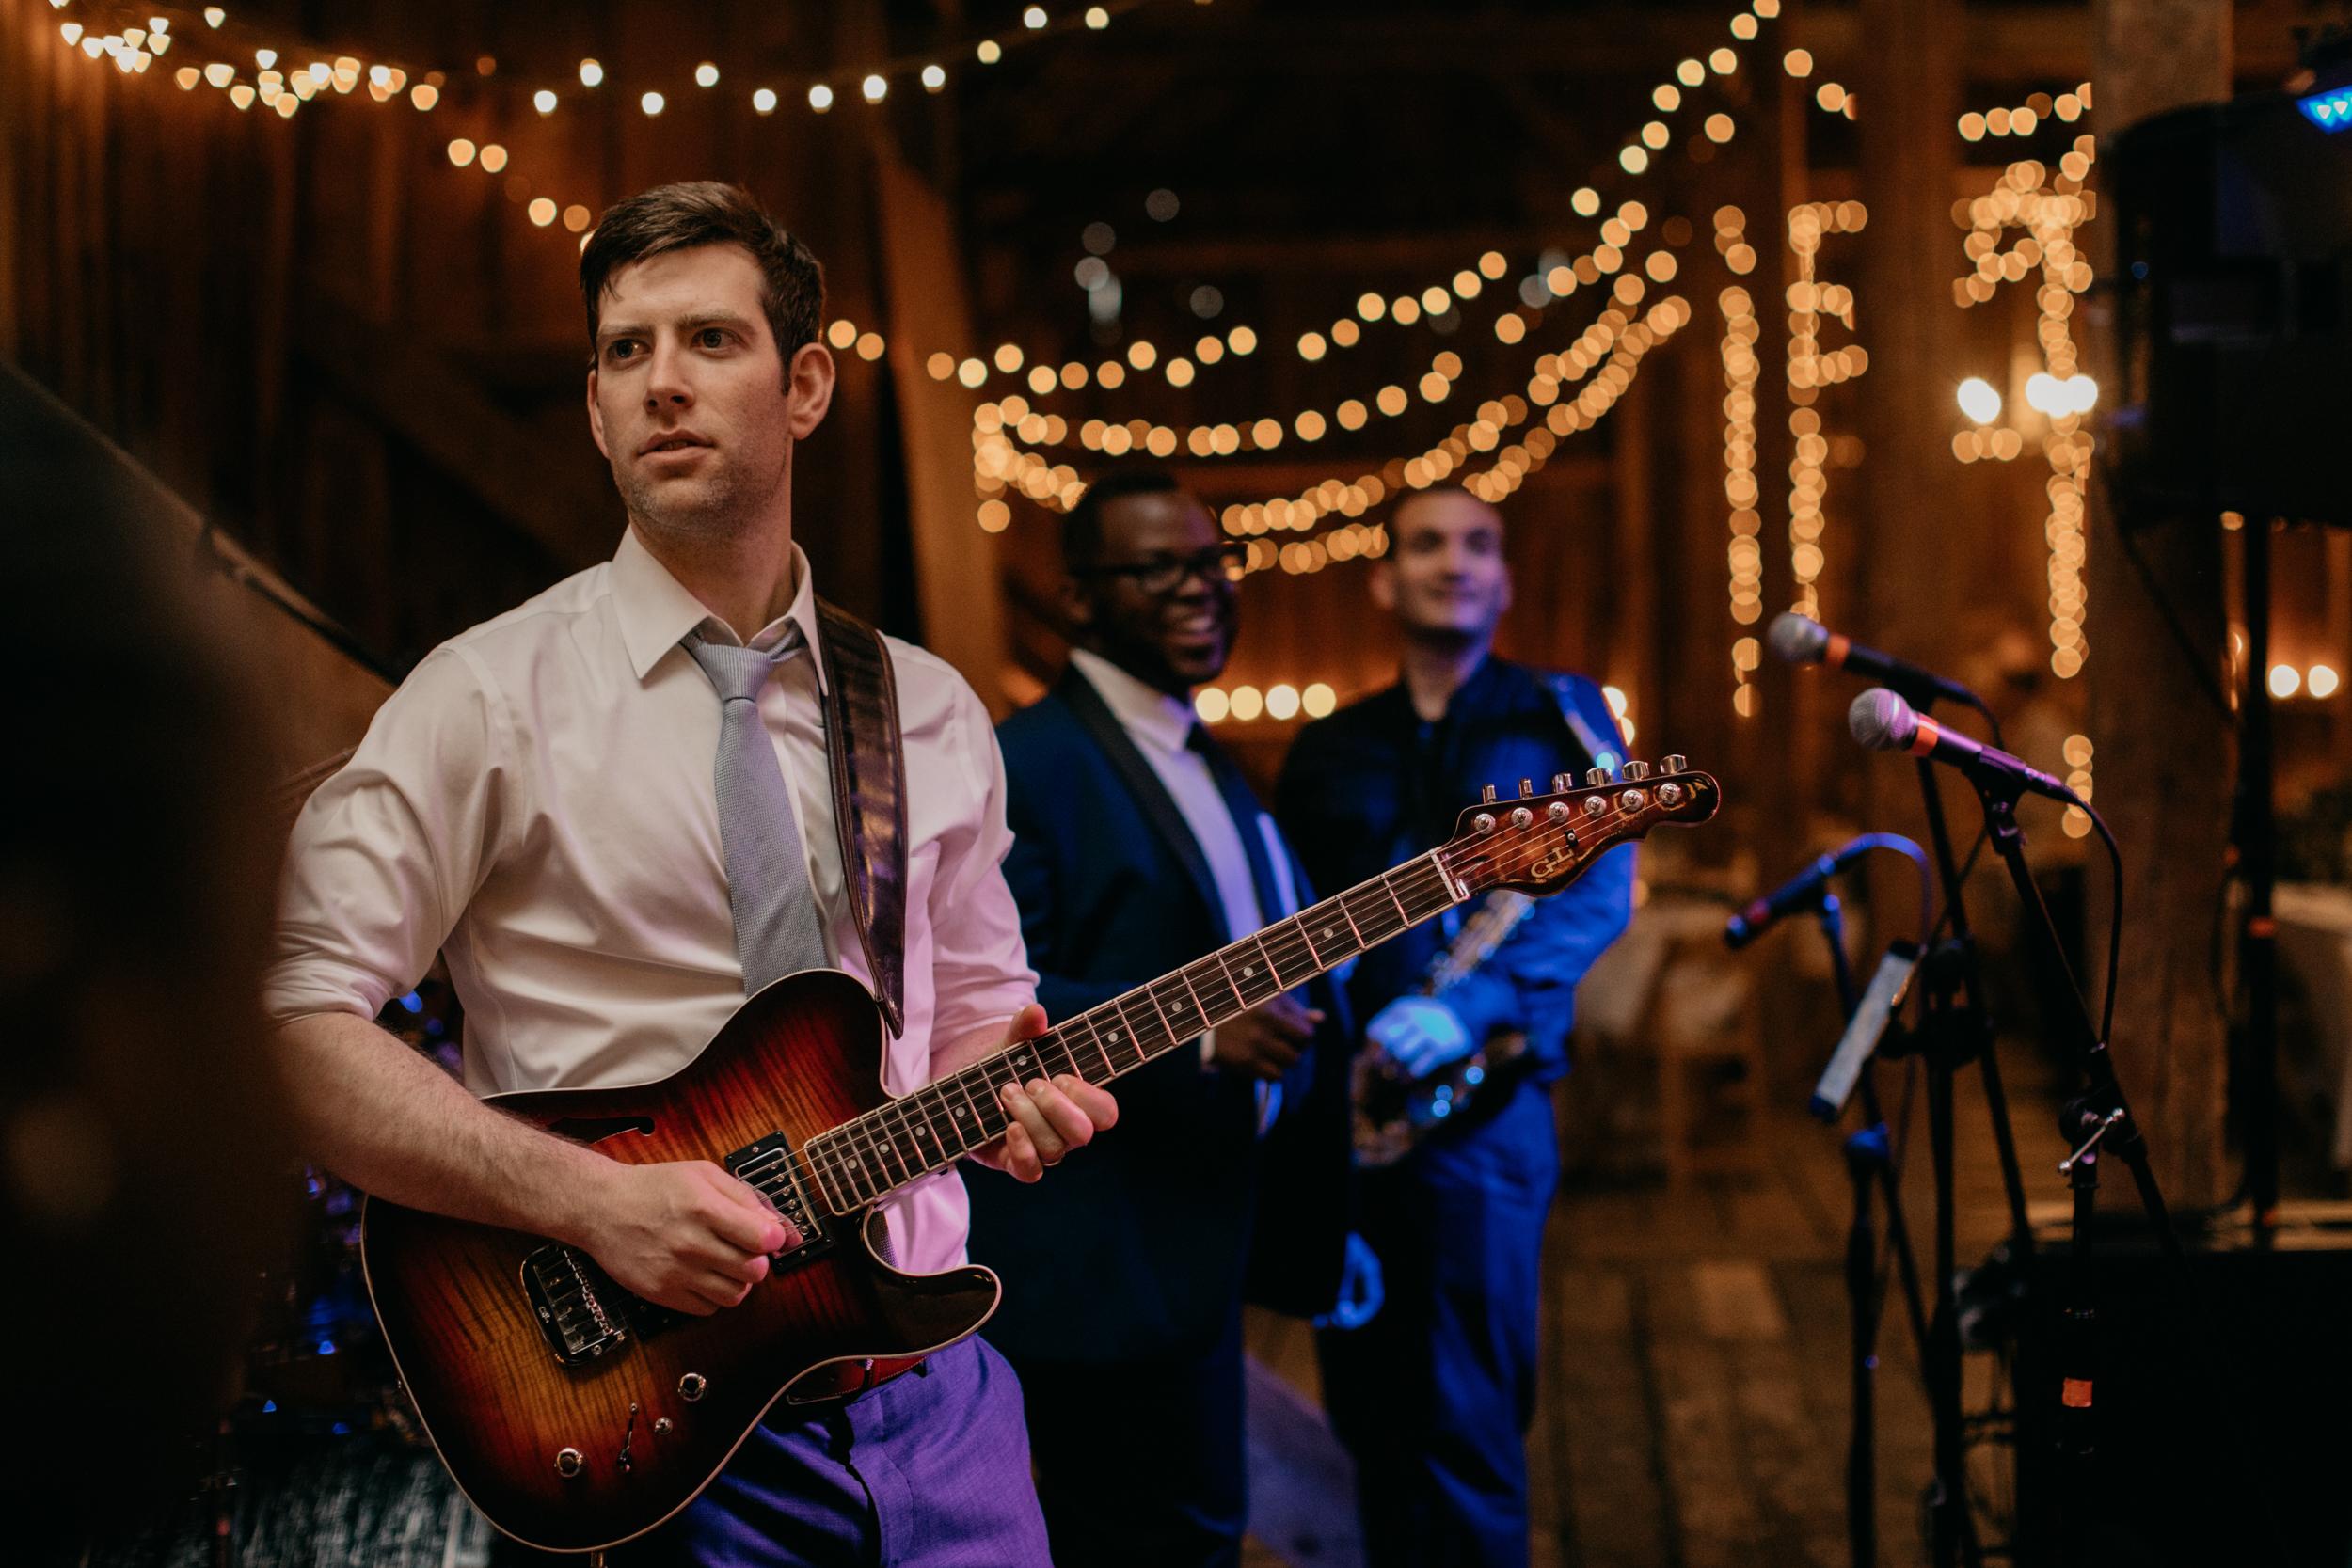 Karen_Alex_Bliss_ridge_farm_Vermont_wedding032.jpg